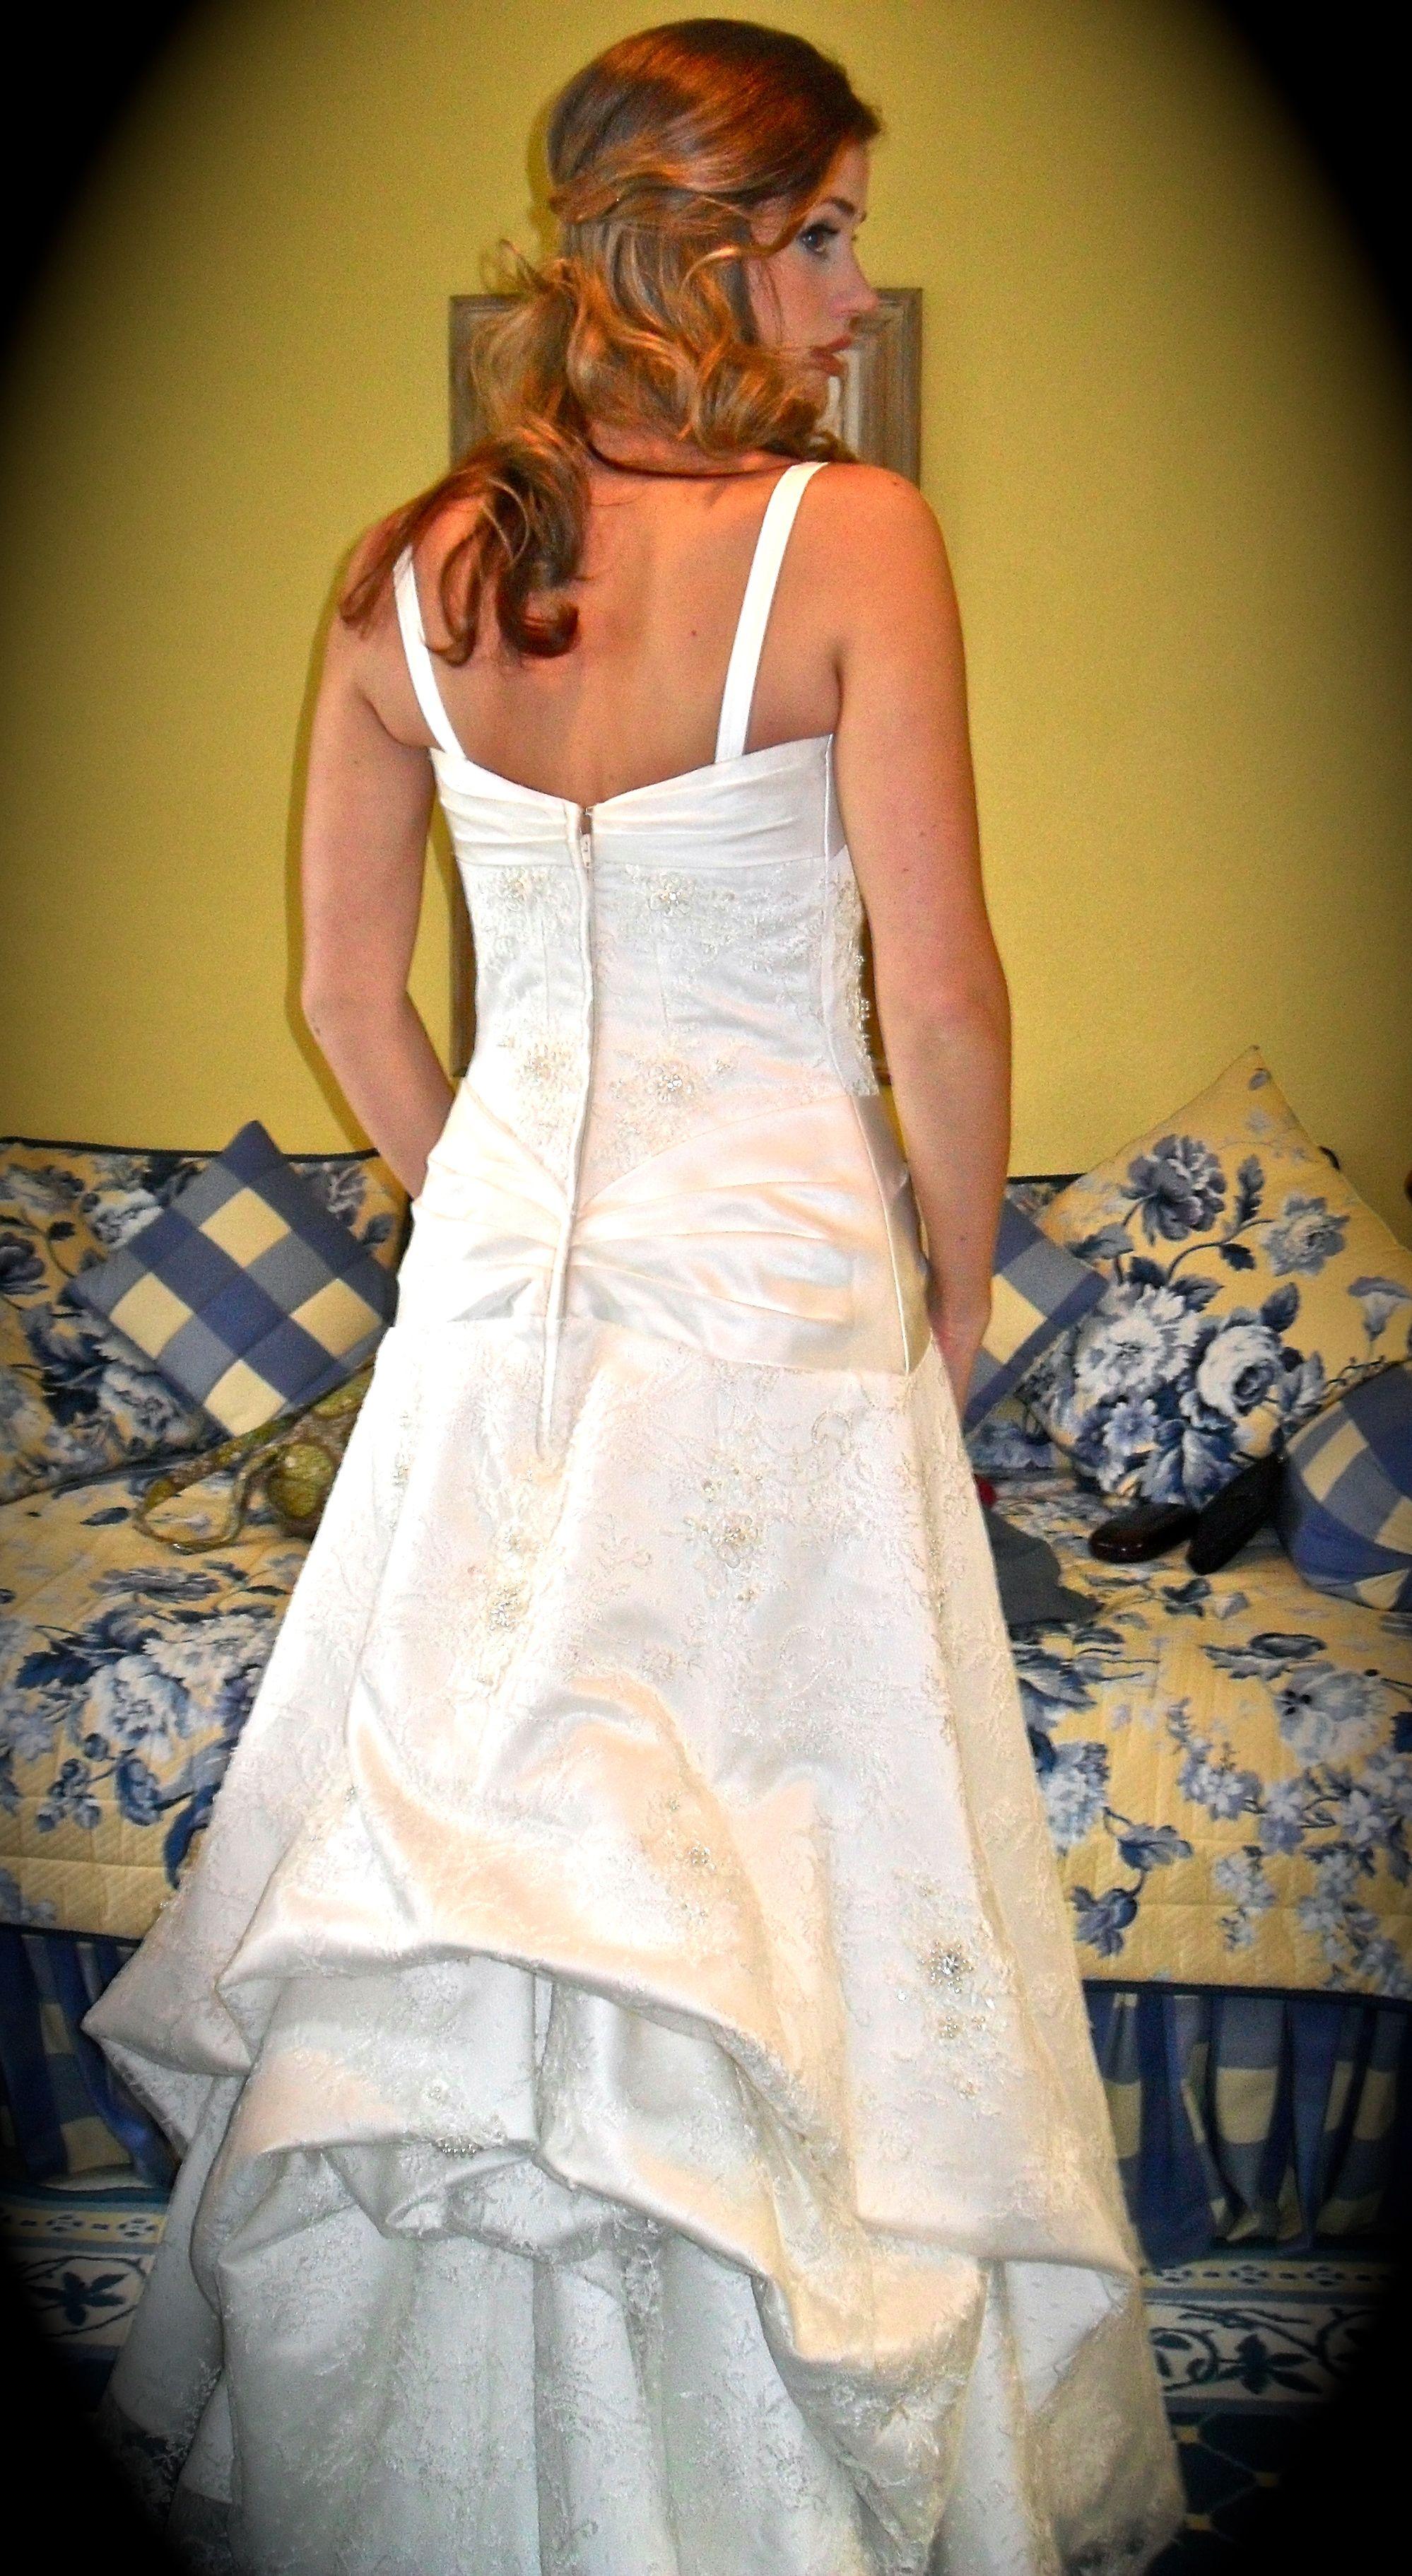 The Under Bustle for a wedding dress Wedding dress train